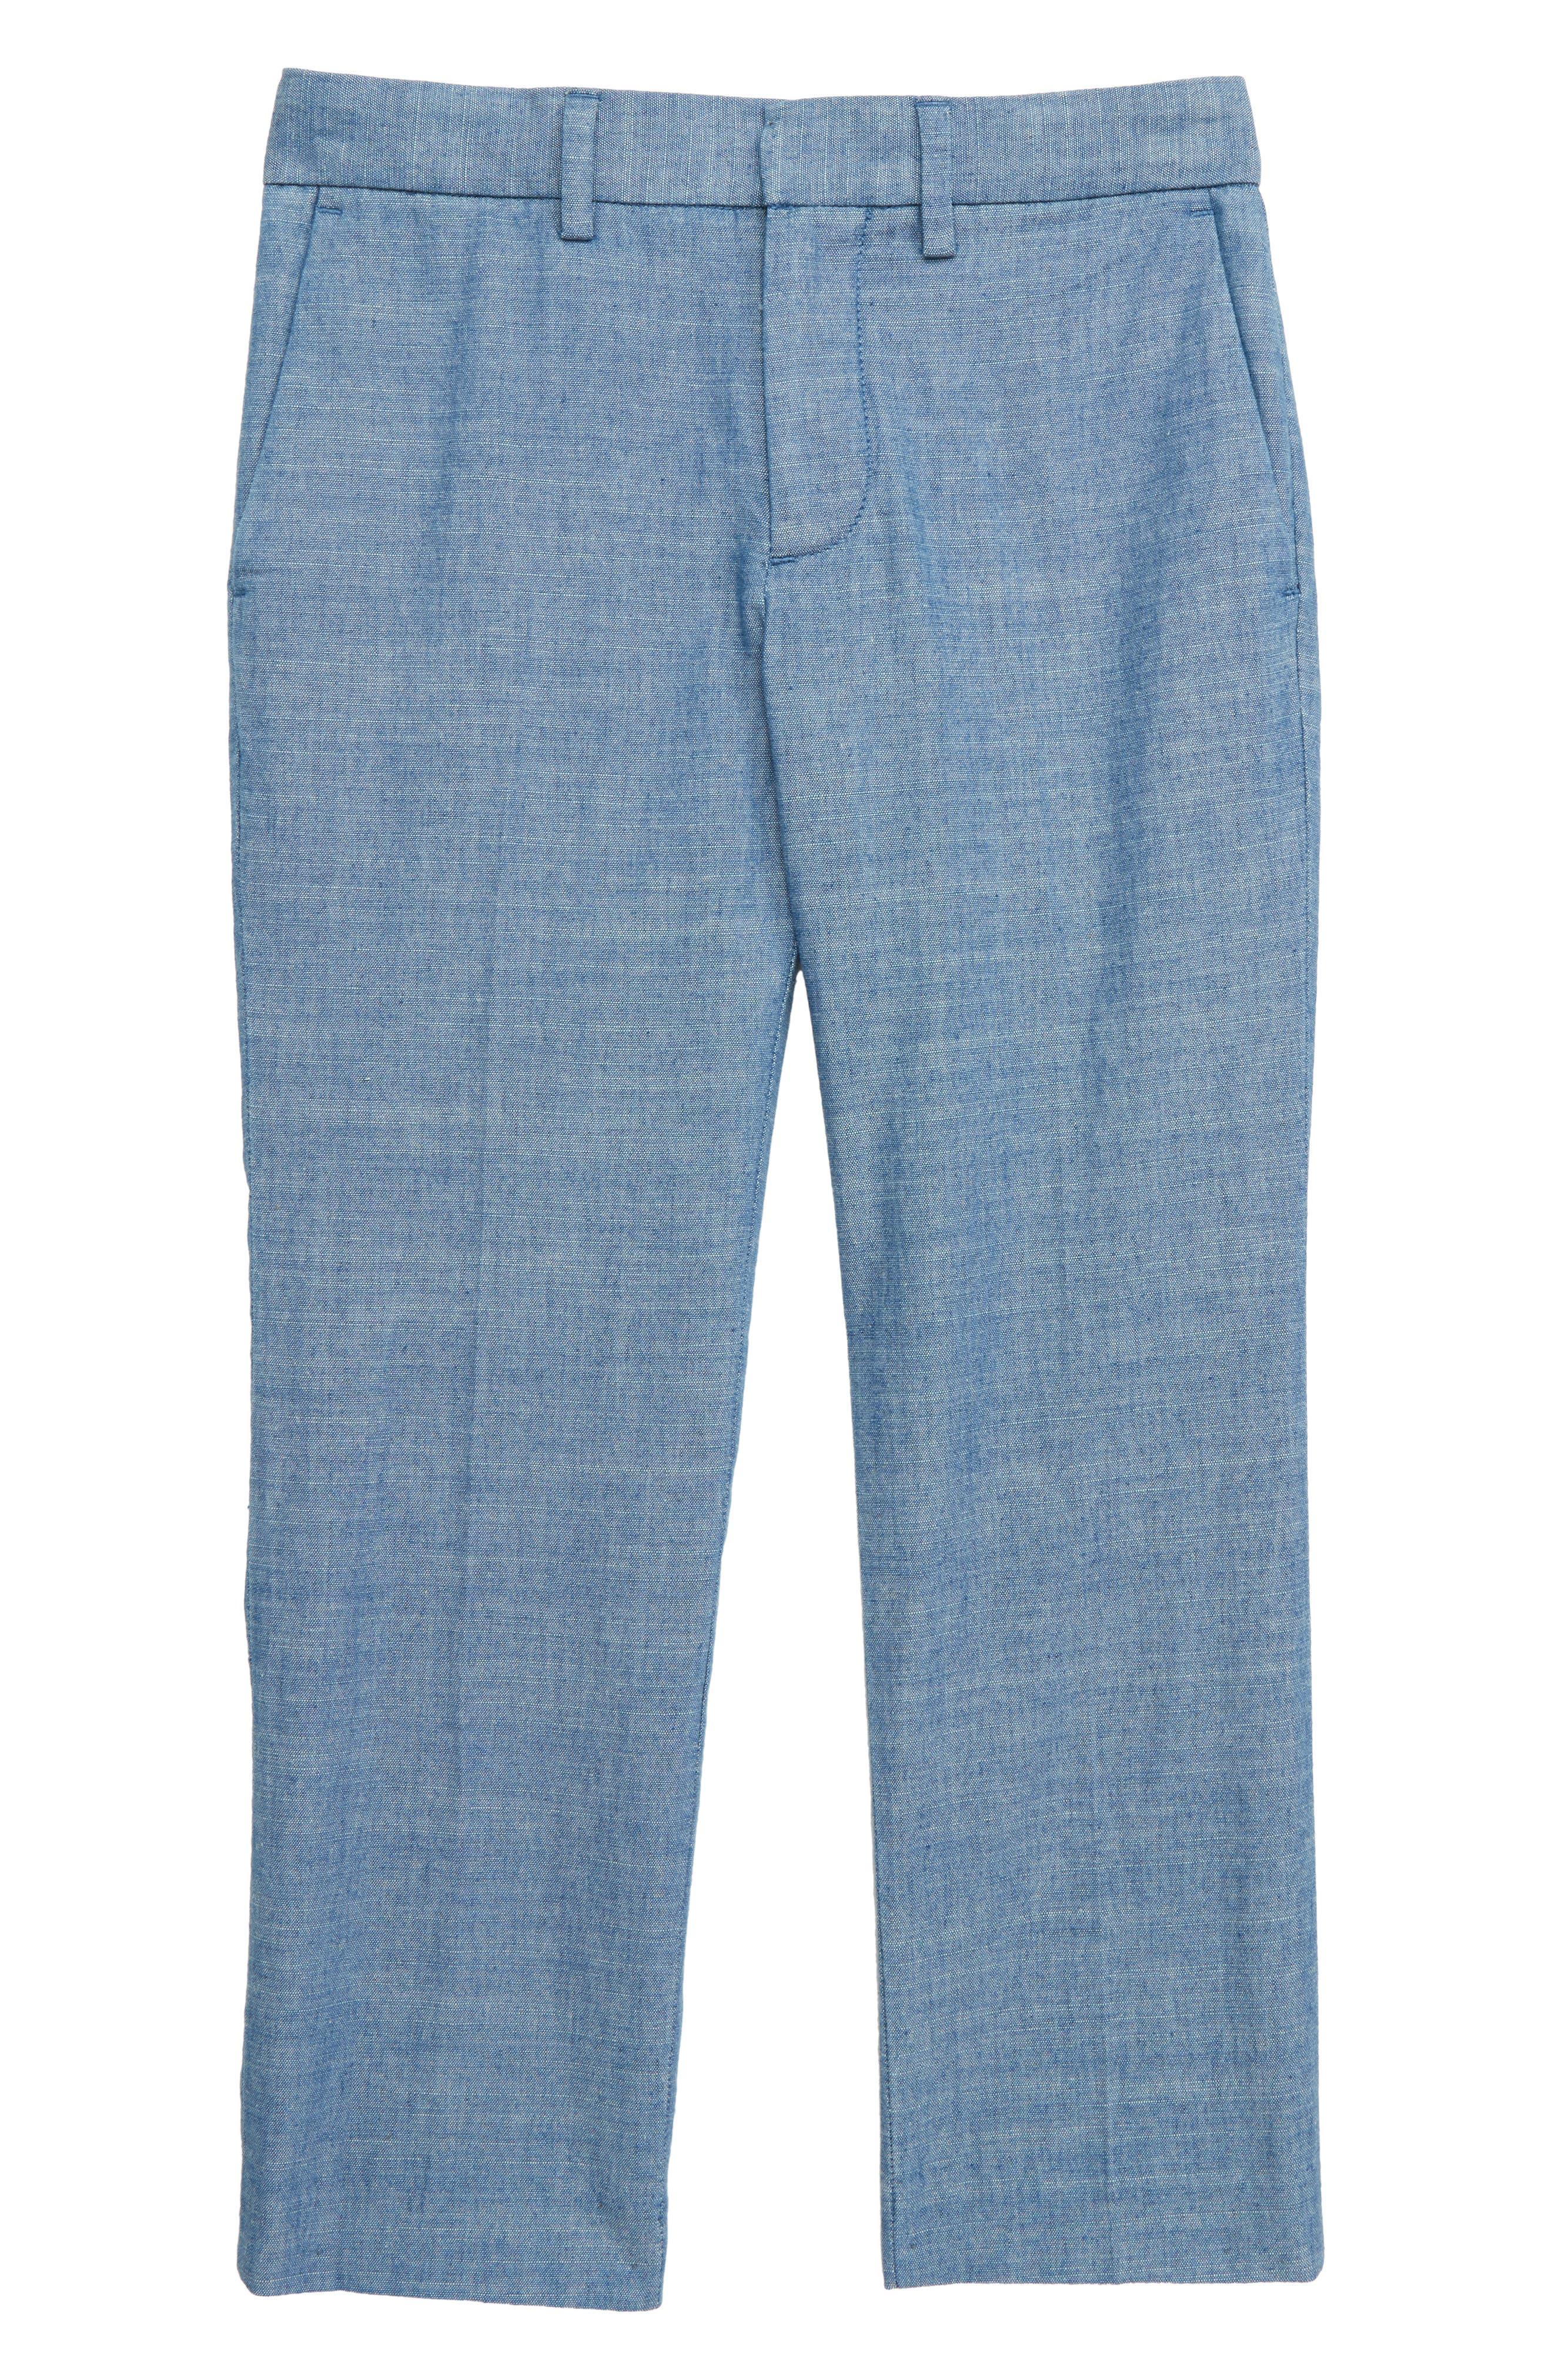 Boys Crewcuts By Jcrew Ludlow Chambray Suit Pants Size 6  Blue